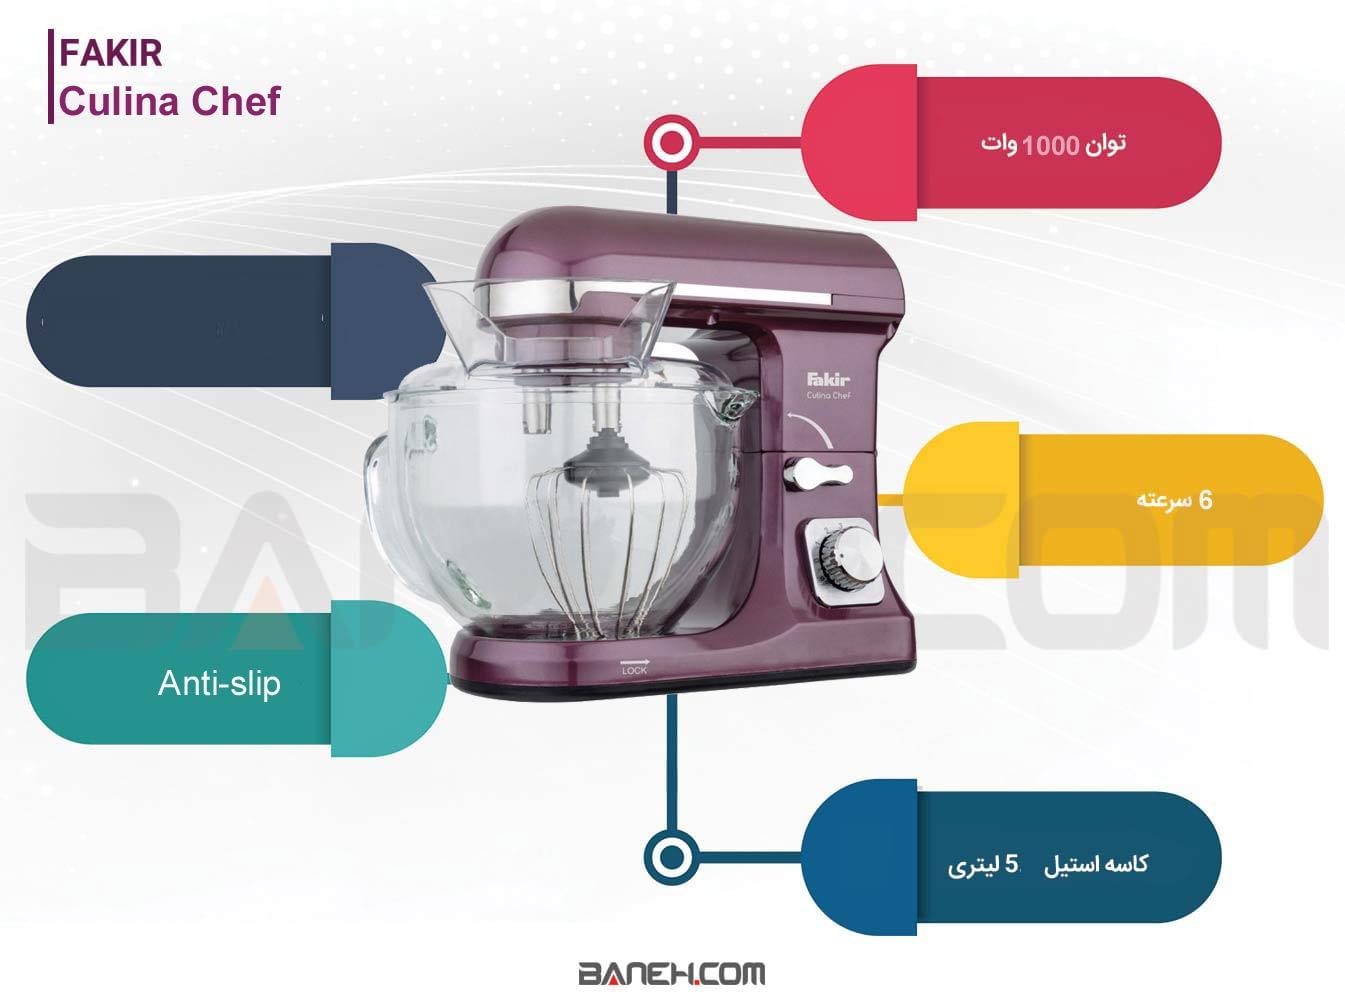 Culina Chef